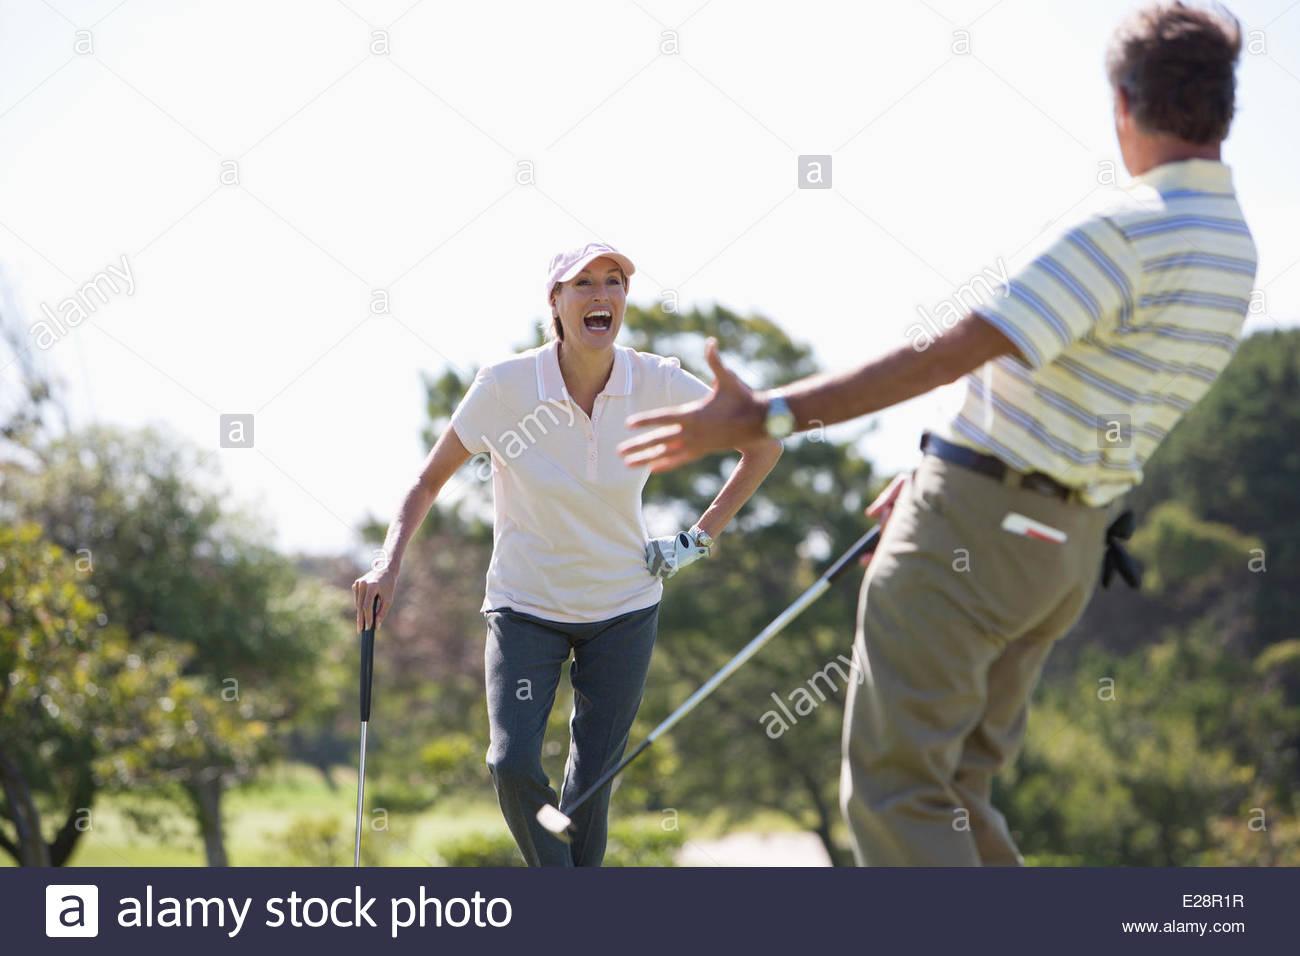 Pareja madura disfrutando de golf Imagen De Stock